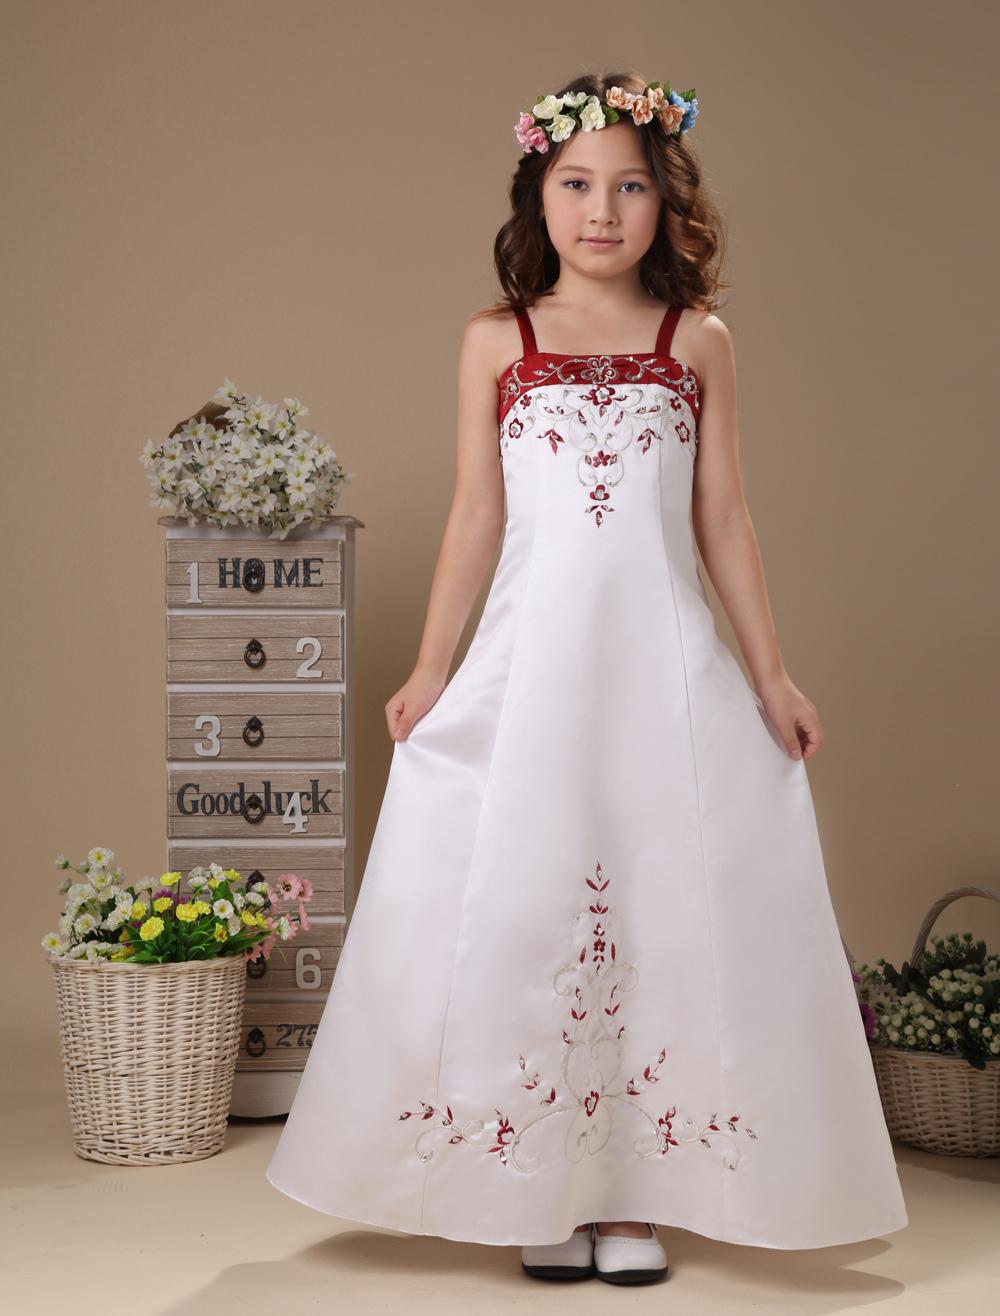 c66b70f0aa1eb Erstkommunion Kleid Großhandel Erstkommunion Kleid Online   Milanoo.com